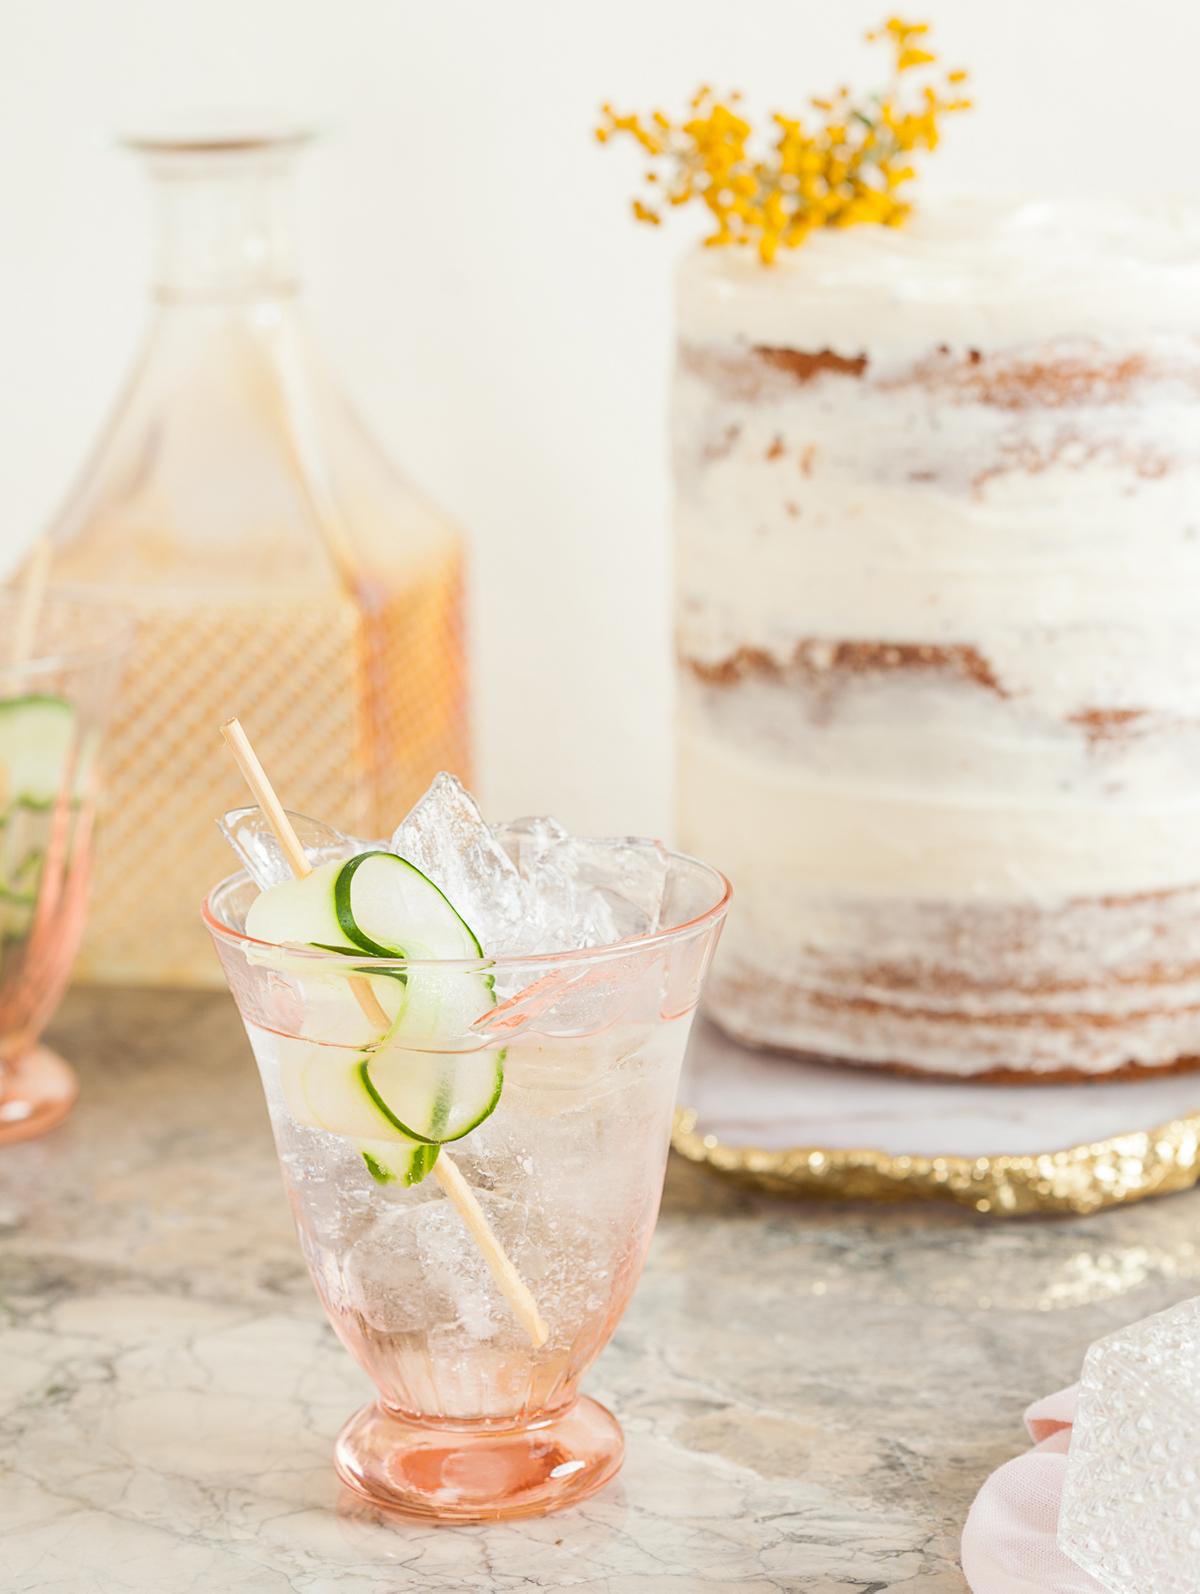 lychee_layer_cake_cucumber_drink.jpg